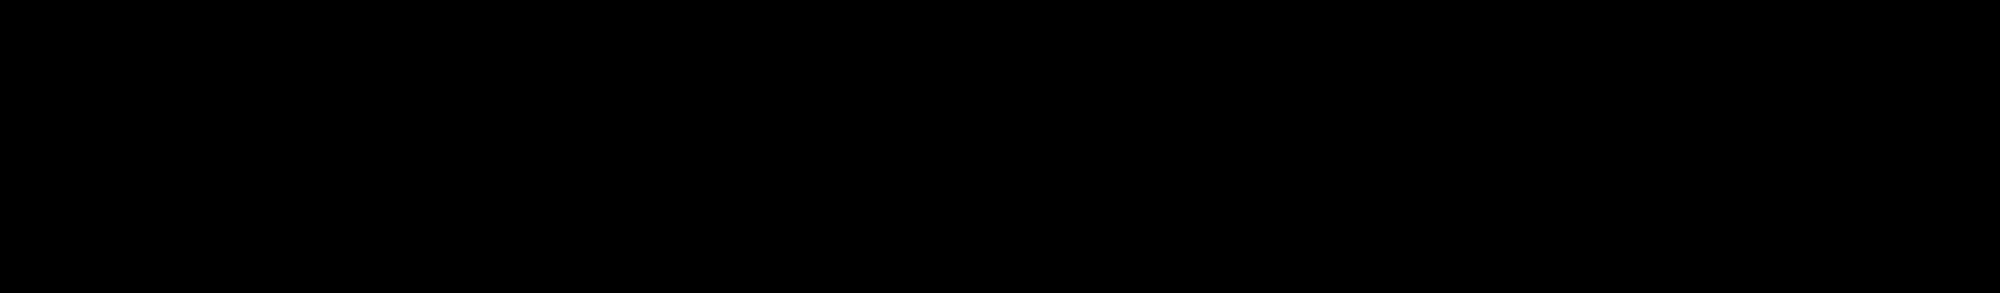 Gütermann_logo